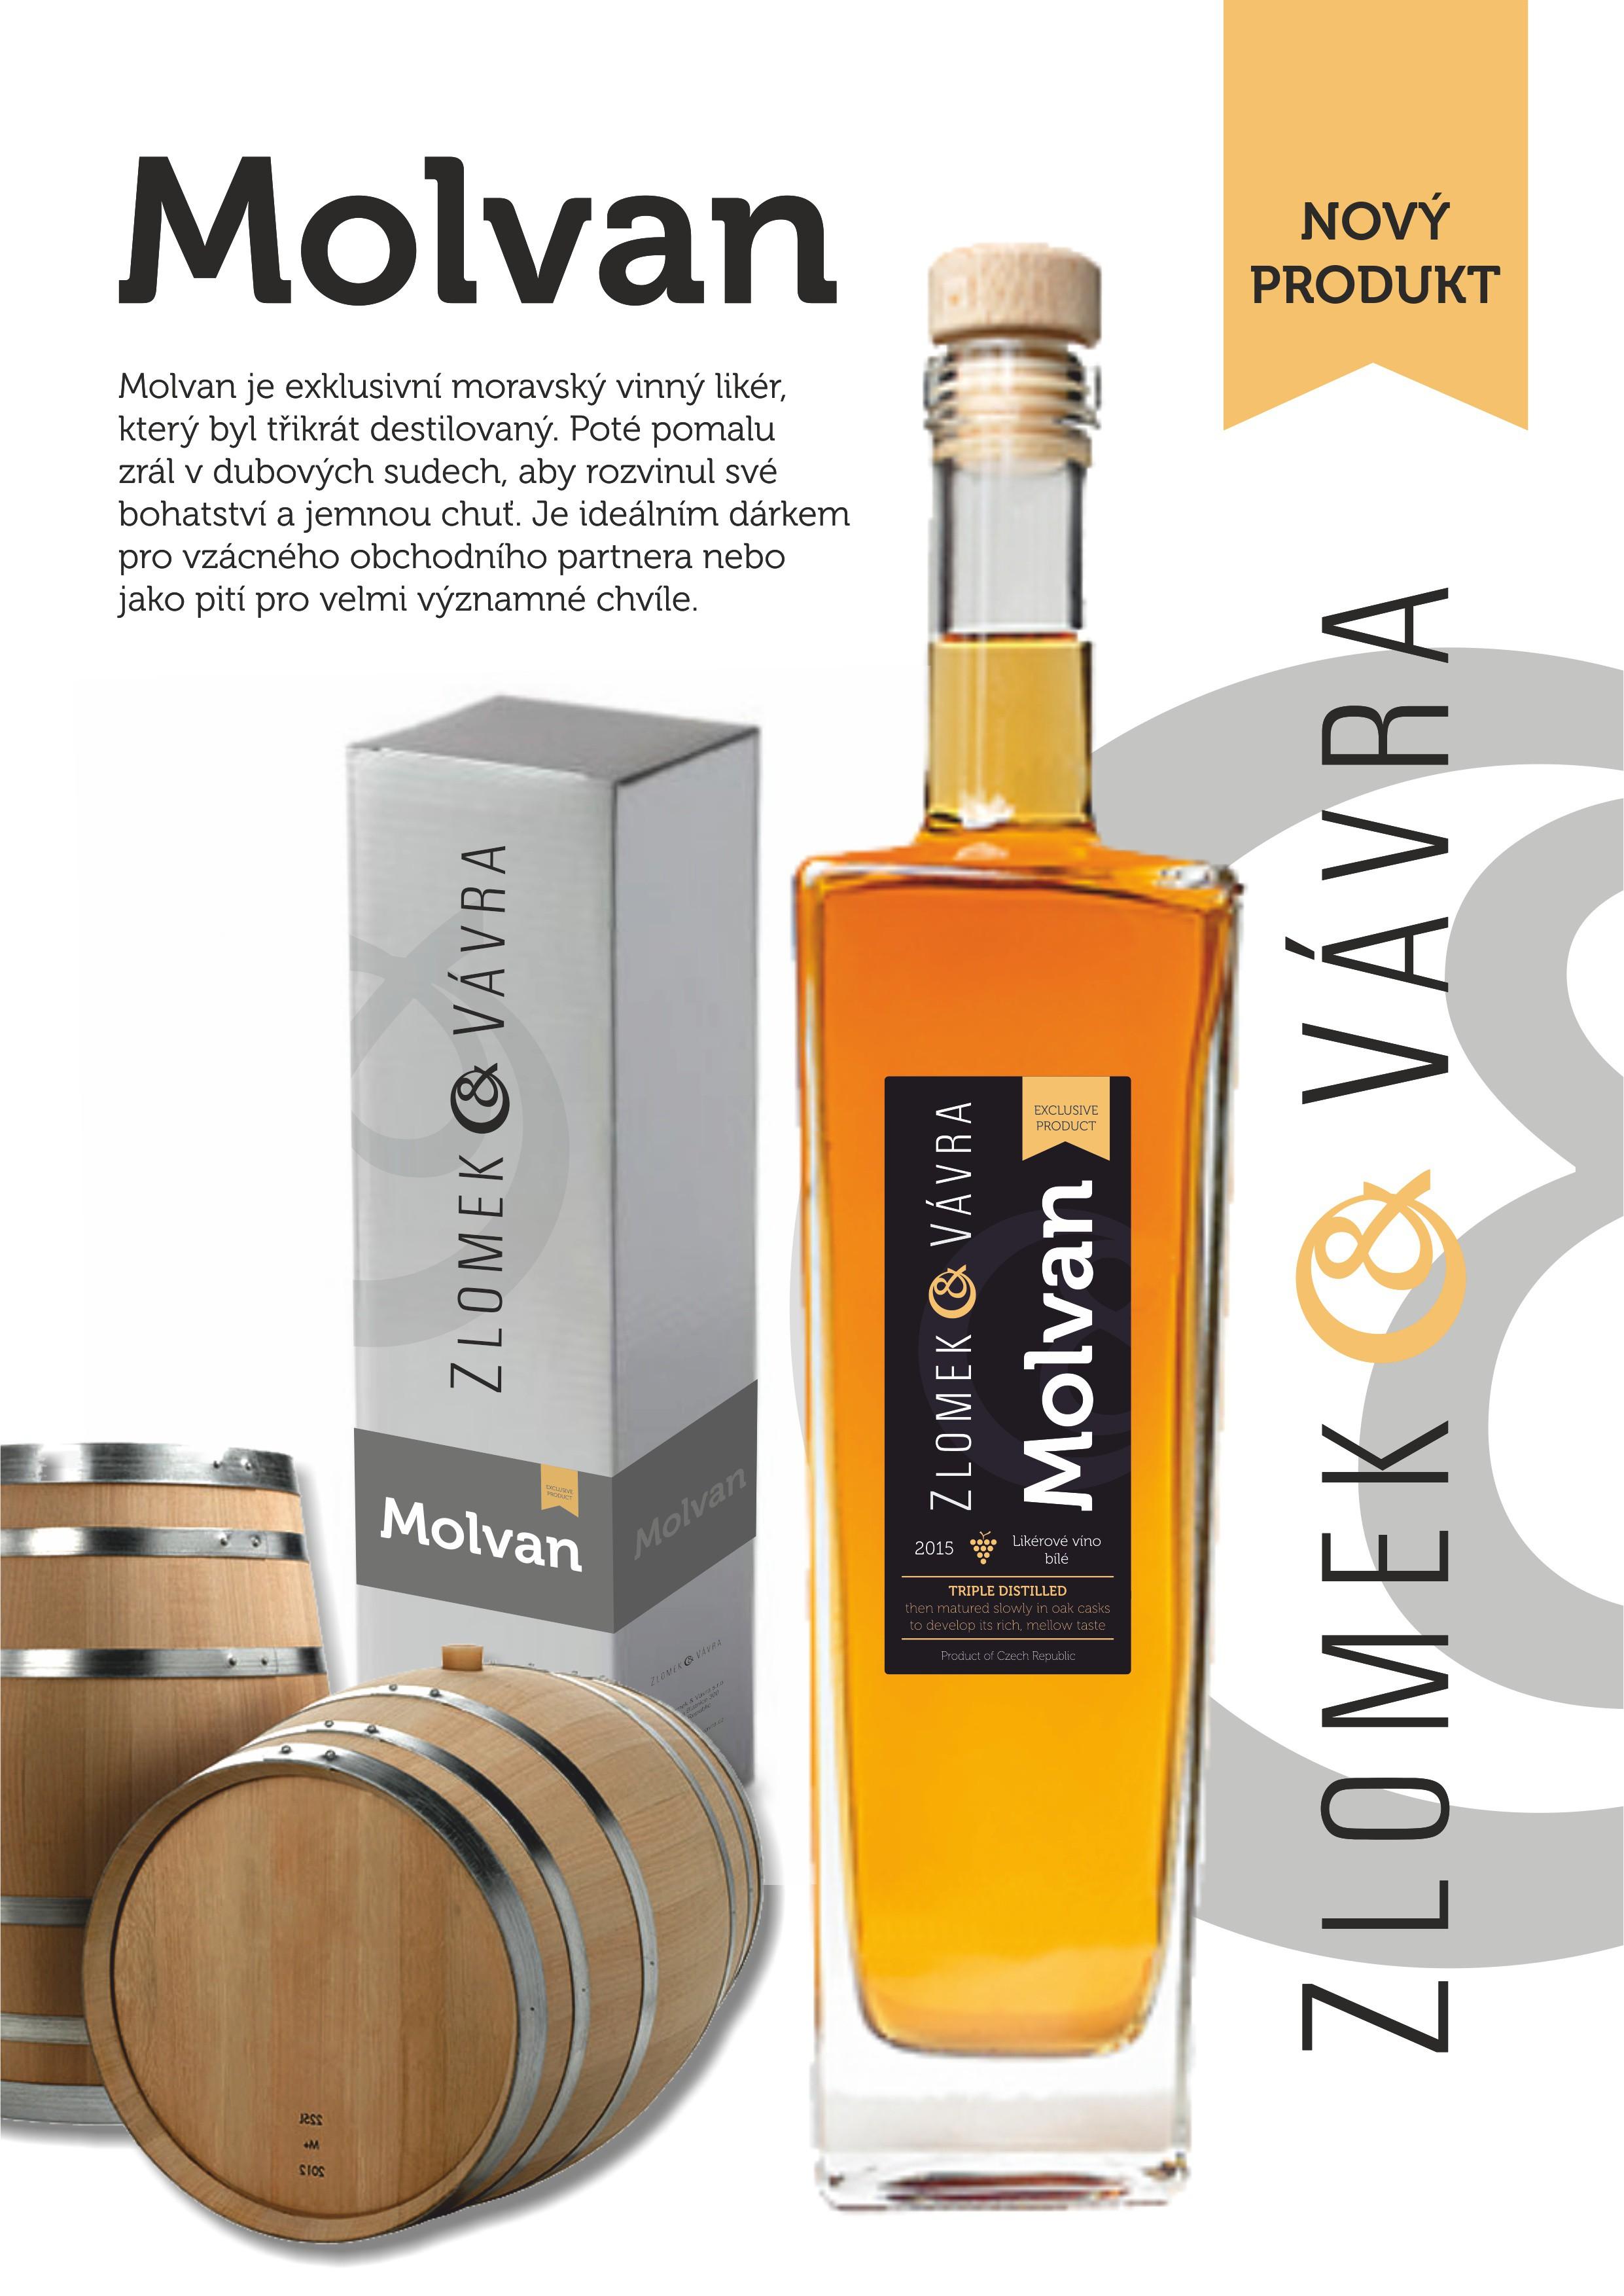 Zlomek & Vávra - MOLVAN vinný likér